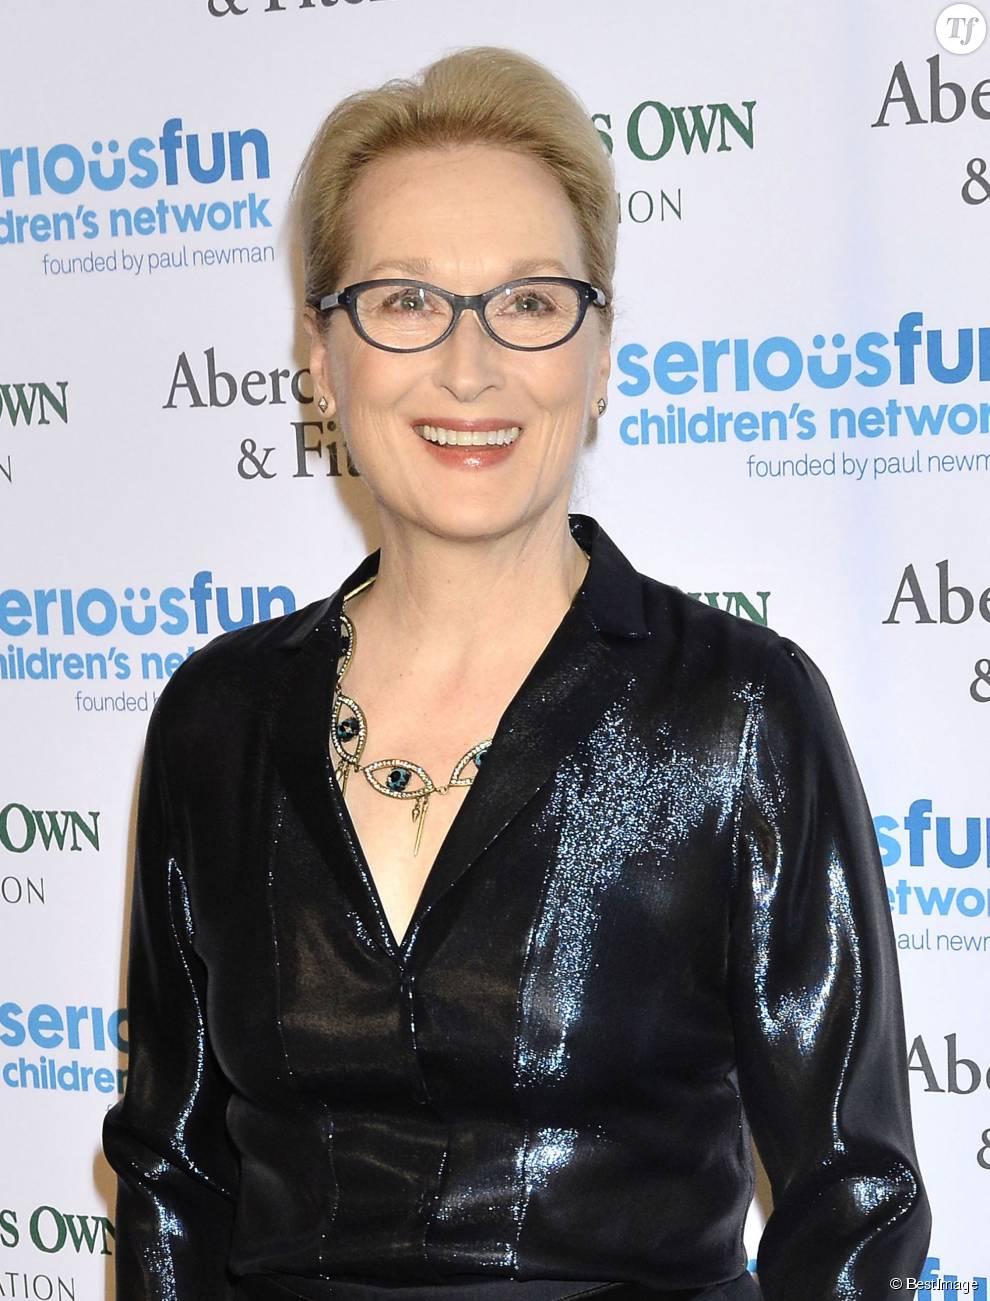 Pour Meryl Streep, Walt Disney est un bigot sexiste !